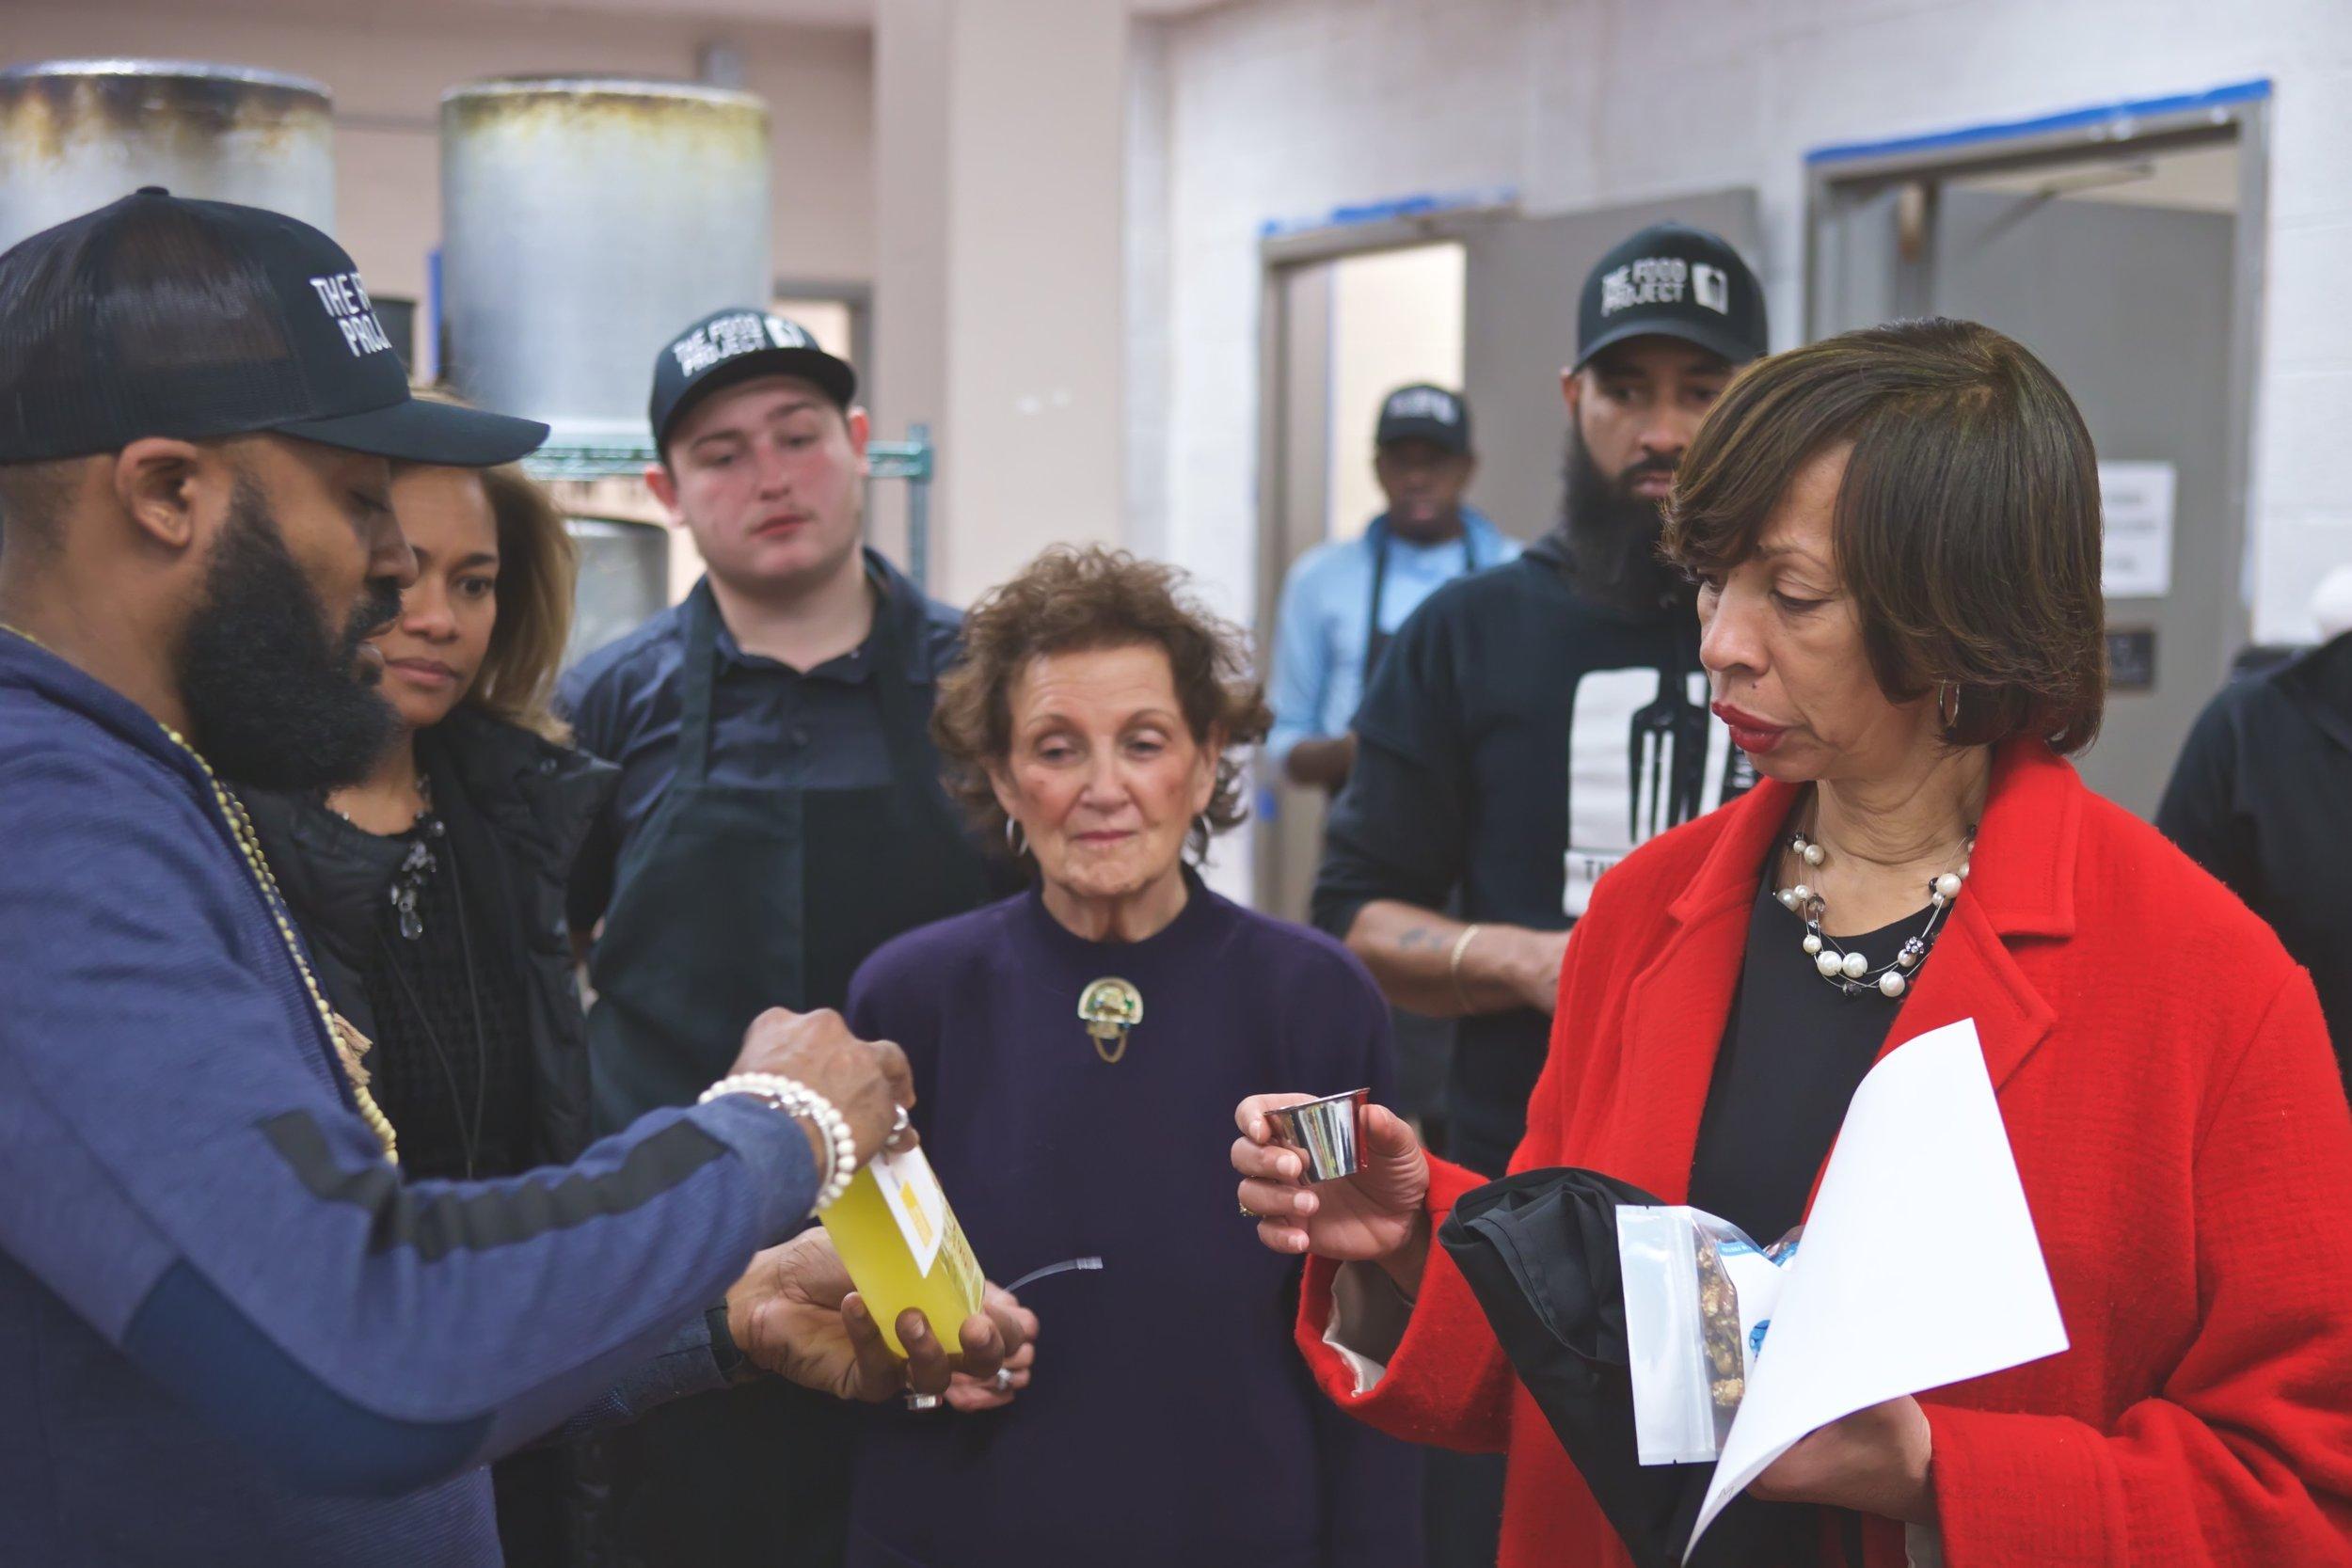 January 26, 2019 - Site visit to The Food Project, 424 S. Pulaski Street 2019-01-26 (21).jpg